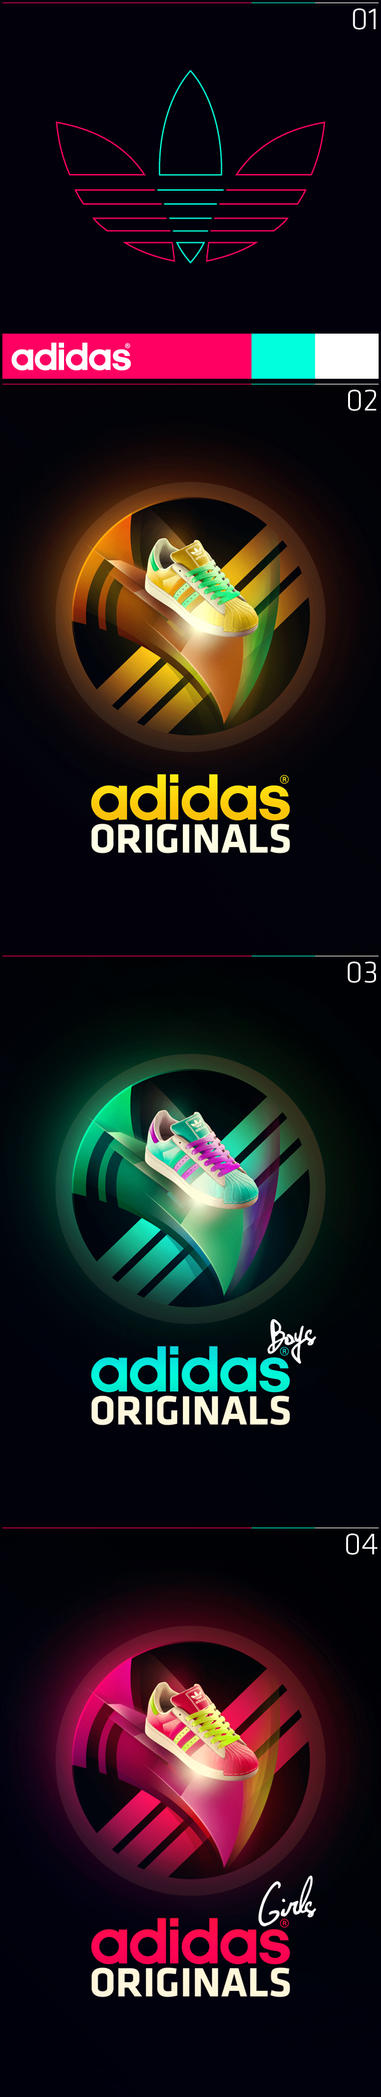 adidas | Originals by madjarov